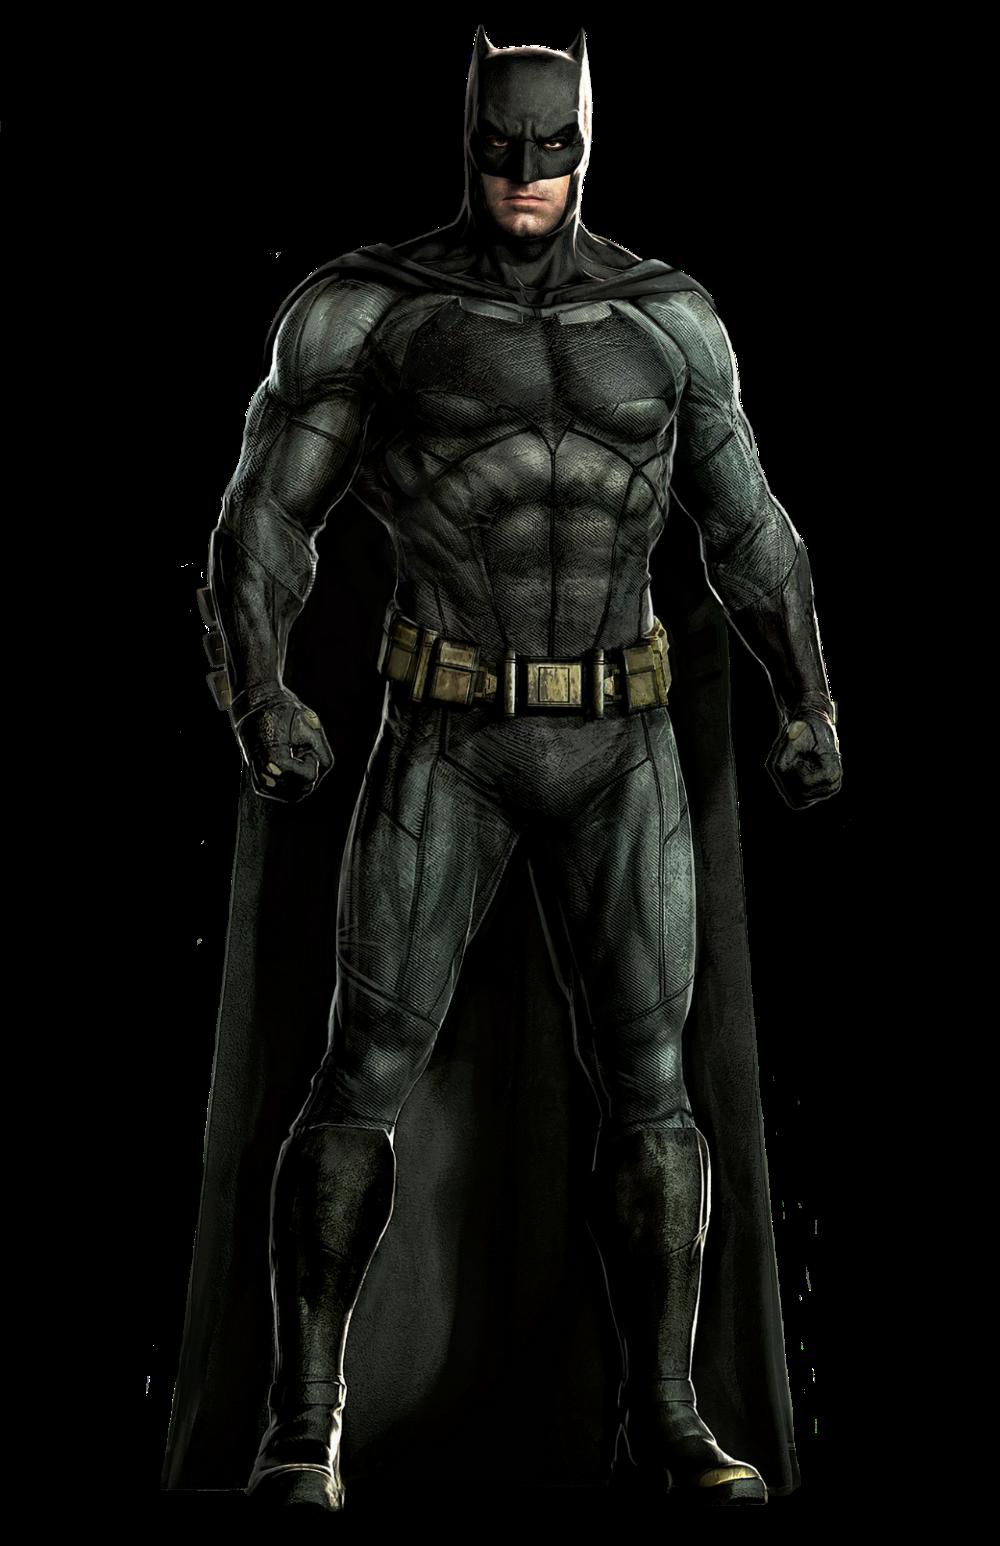 Batman Transparent By Asthonx1 On Deviantart Batman Batman And Superman Marvel Cinematic